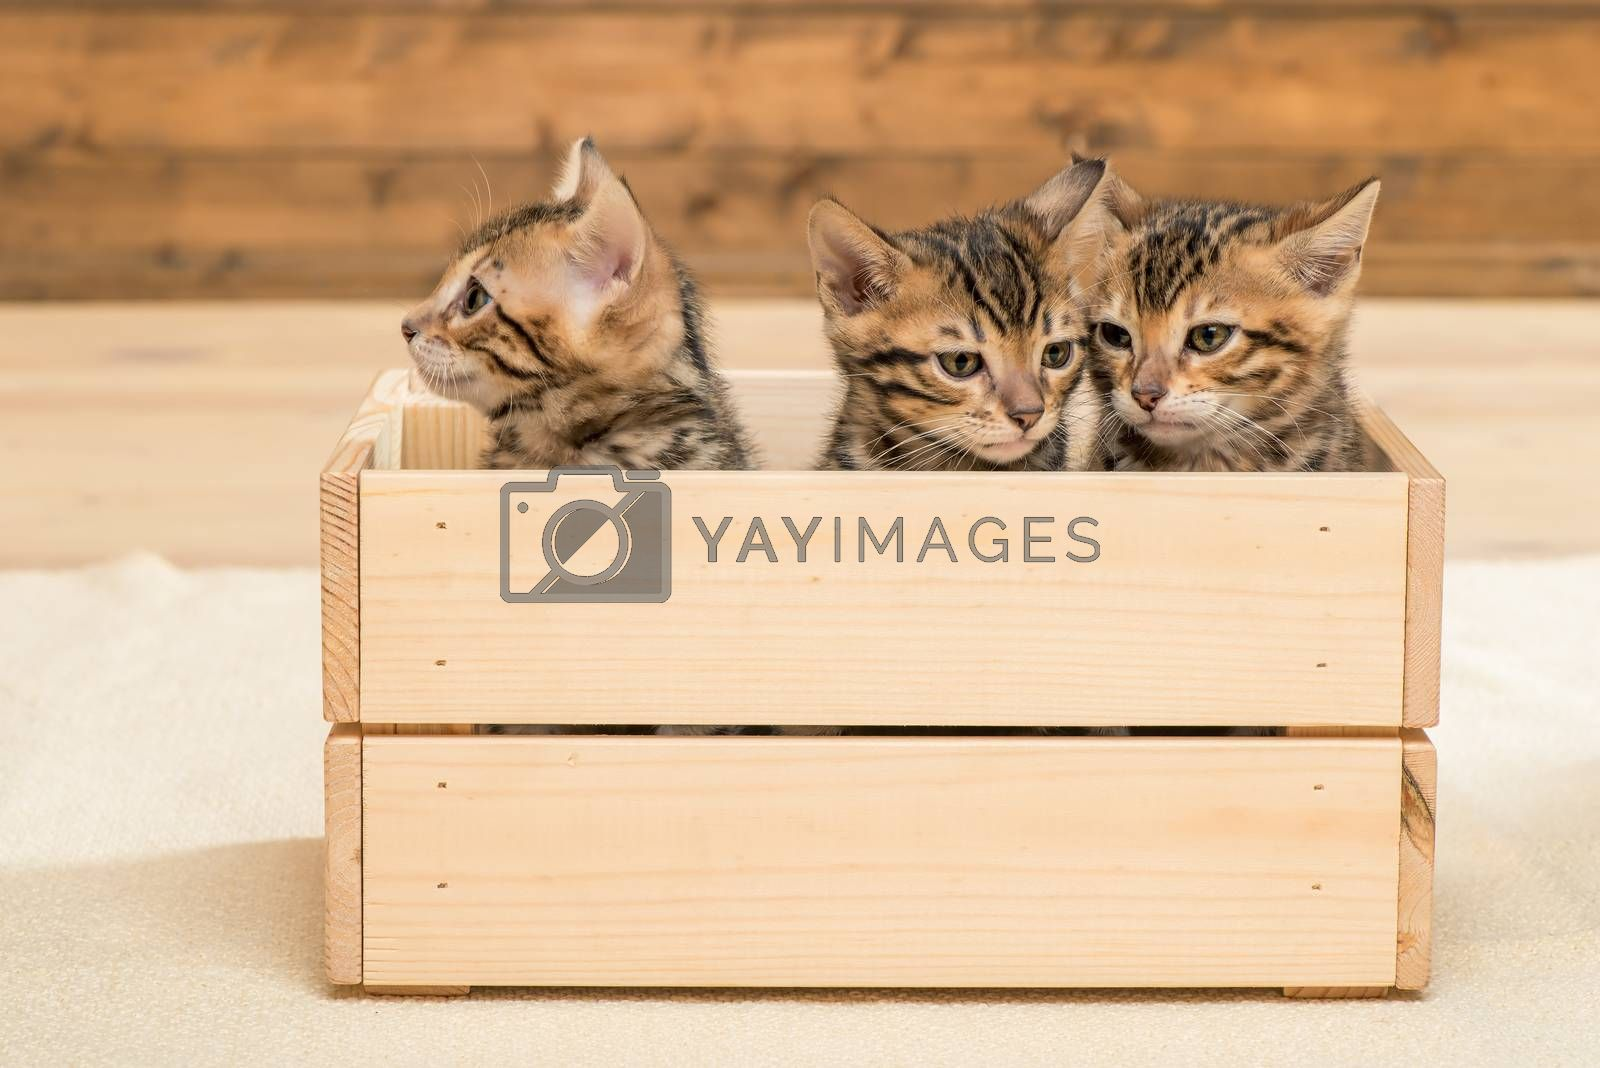 three kittens in a wooden box, closeup portrait of kittens by Labunskiy K.